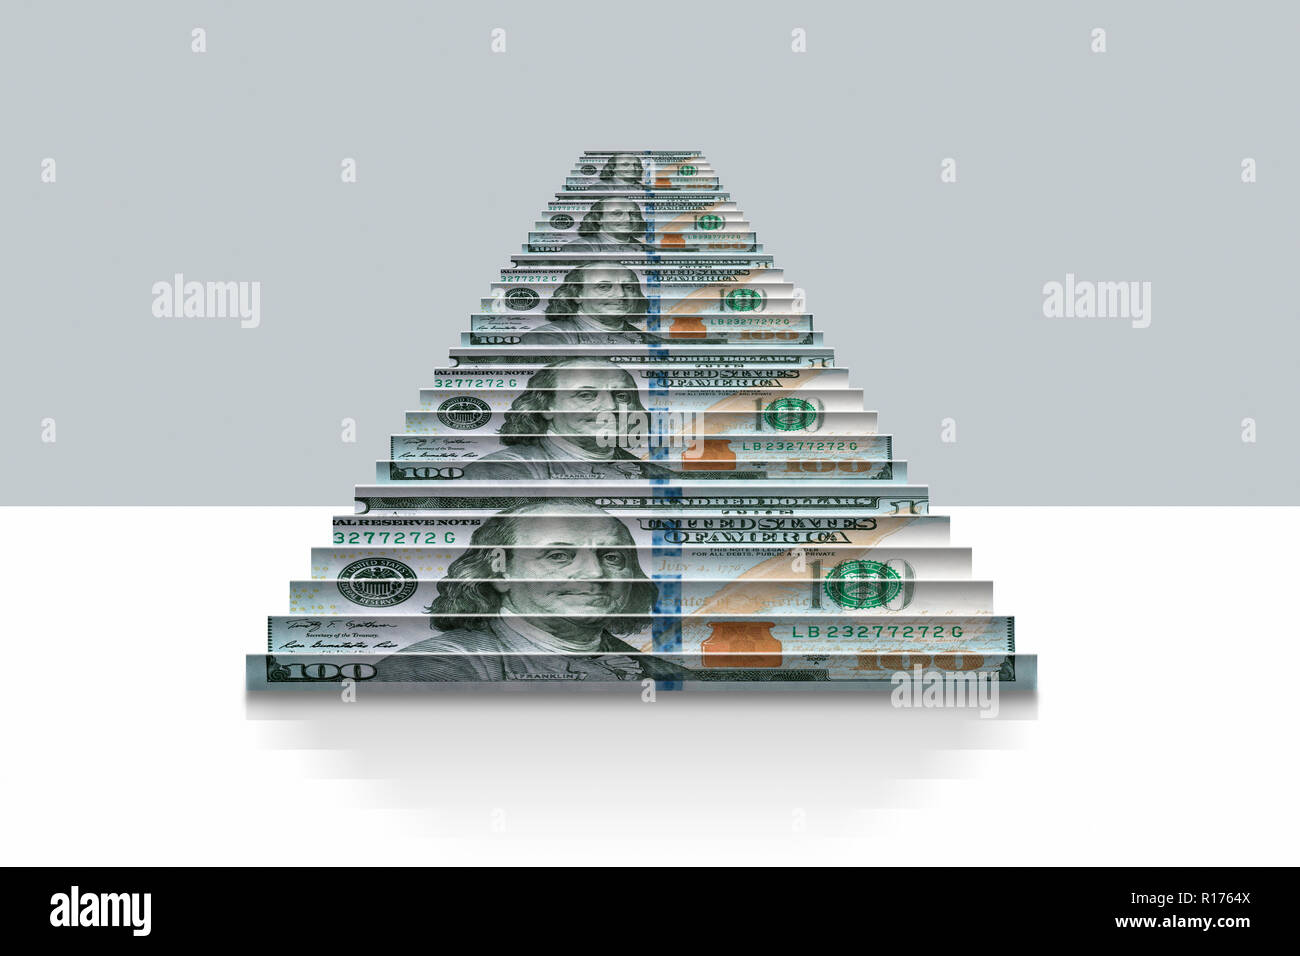 US dollar notes folded into steps, grey background - Stock Image